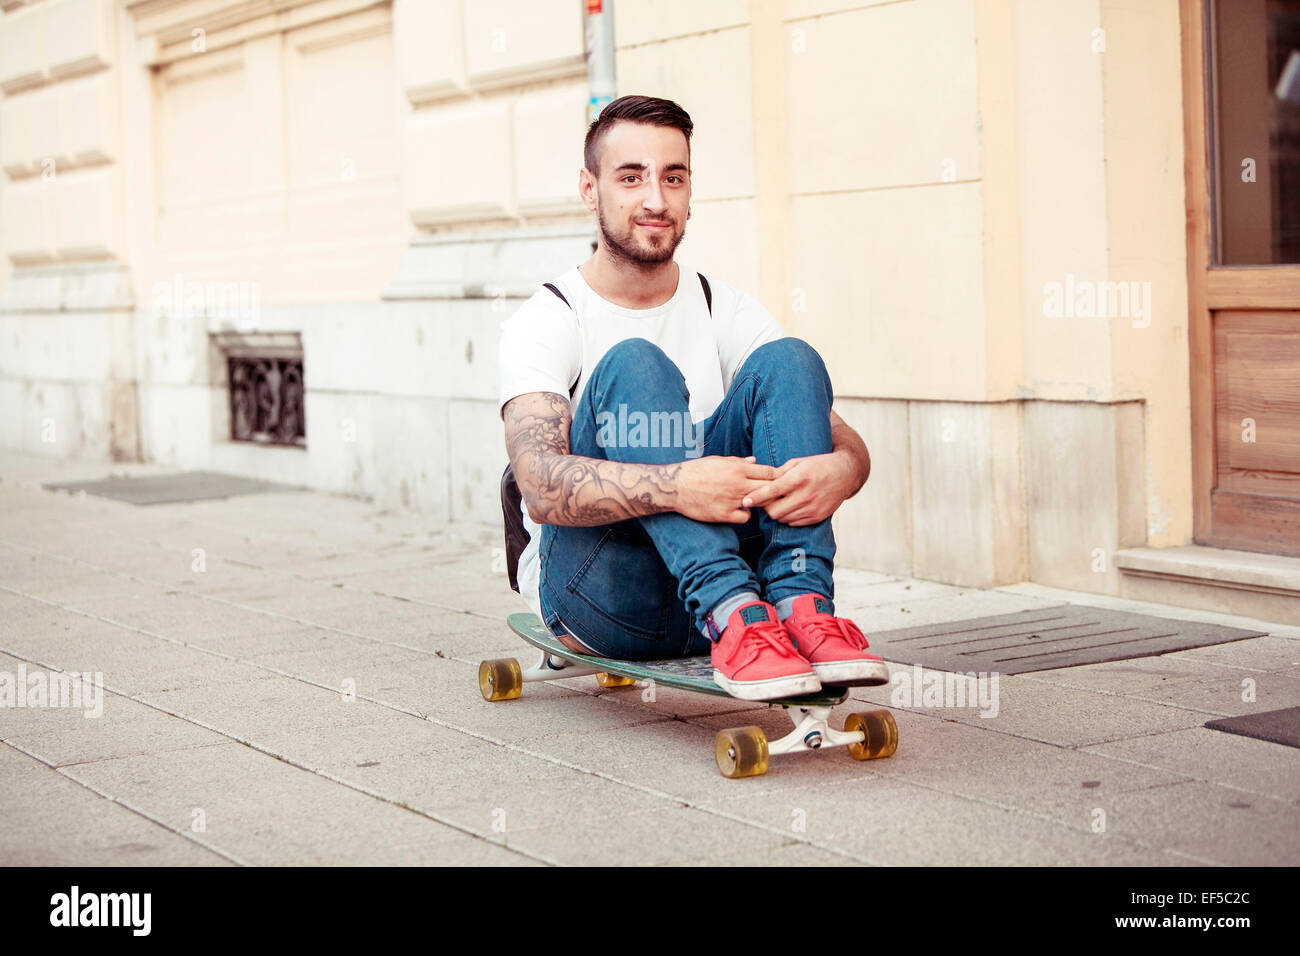 Junger Mann mit Skateboard auf Bürgersteig Stockbild